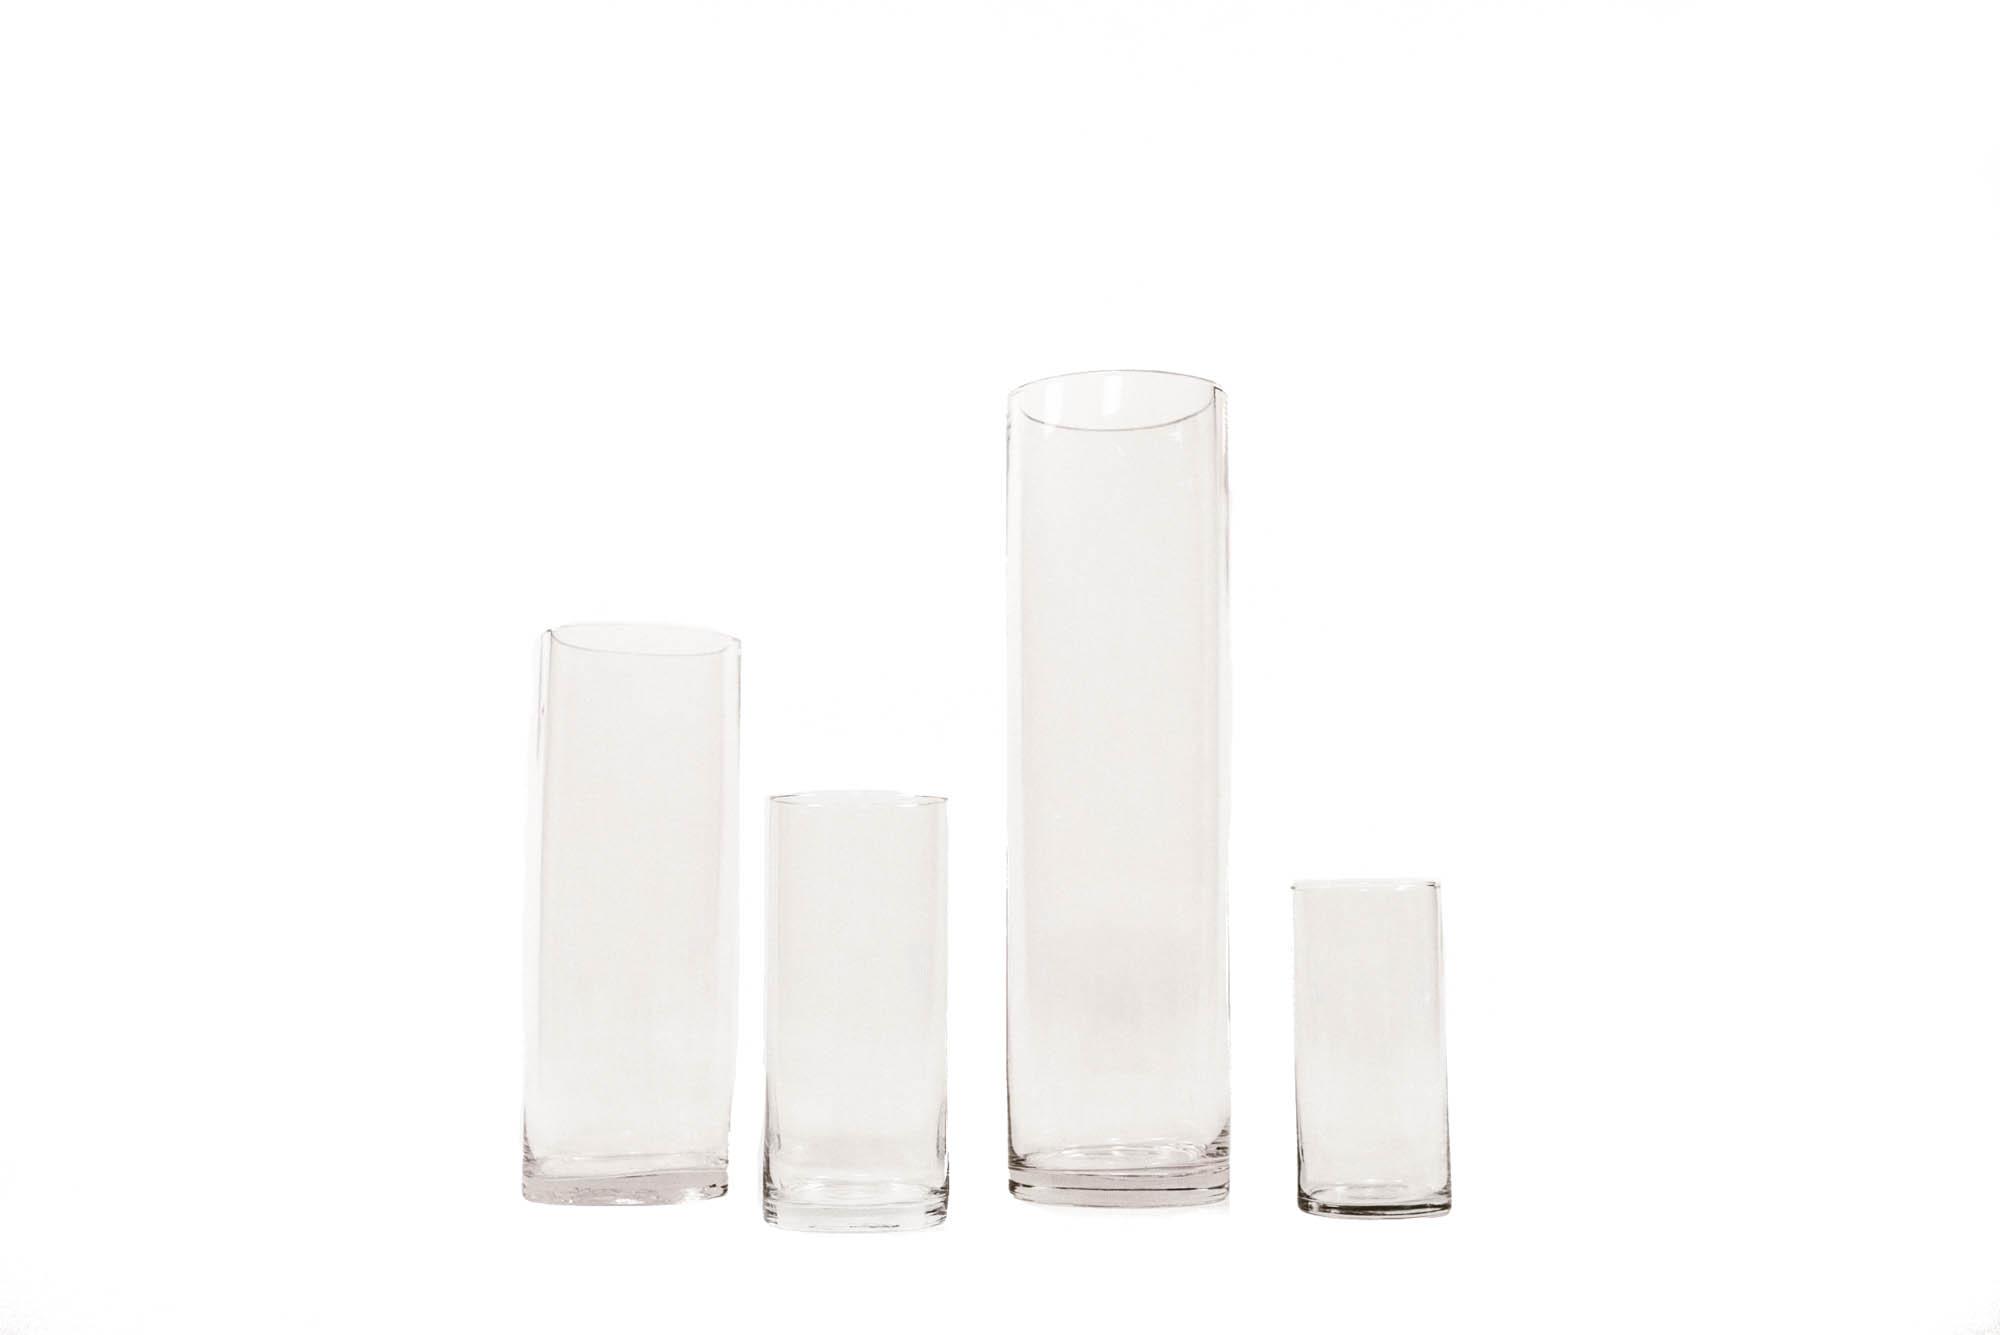 madam vase on ceramic family products silo cylinder ceramica rocky vases sir shop luten